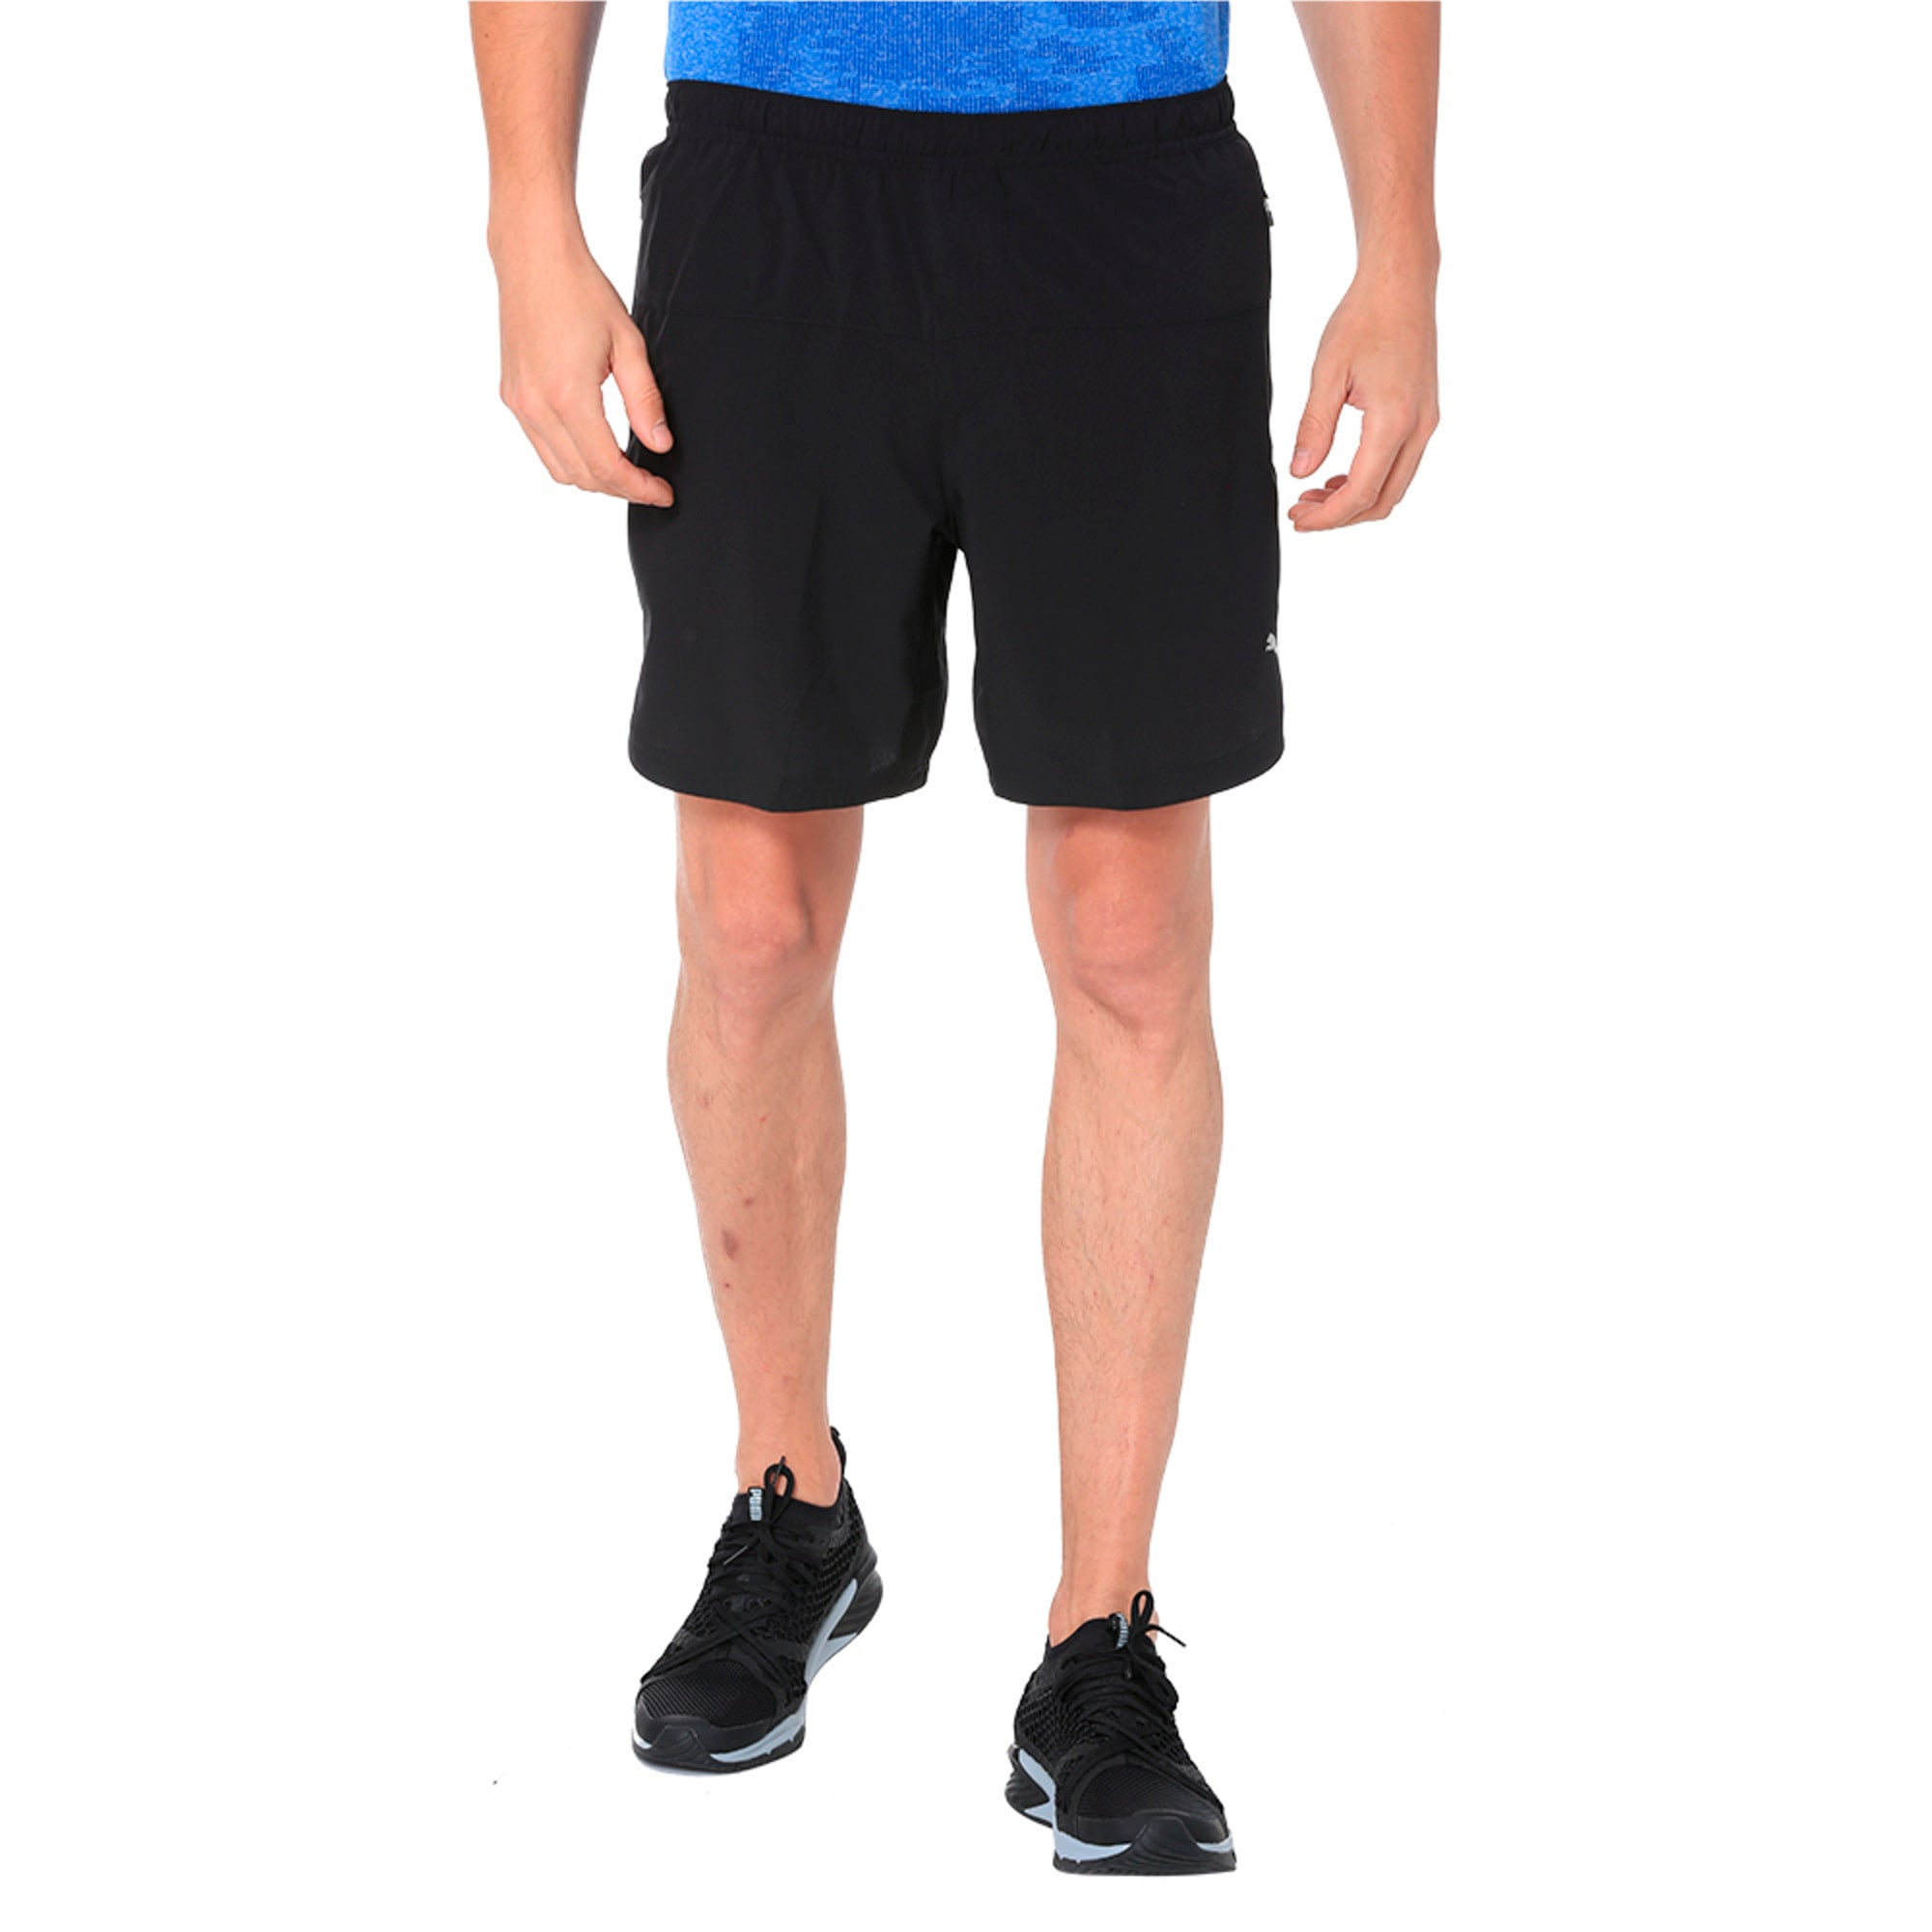 Thumbnail 3 of Pace 7'' Men's Running Shorts, Puma Black, medium-IND